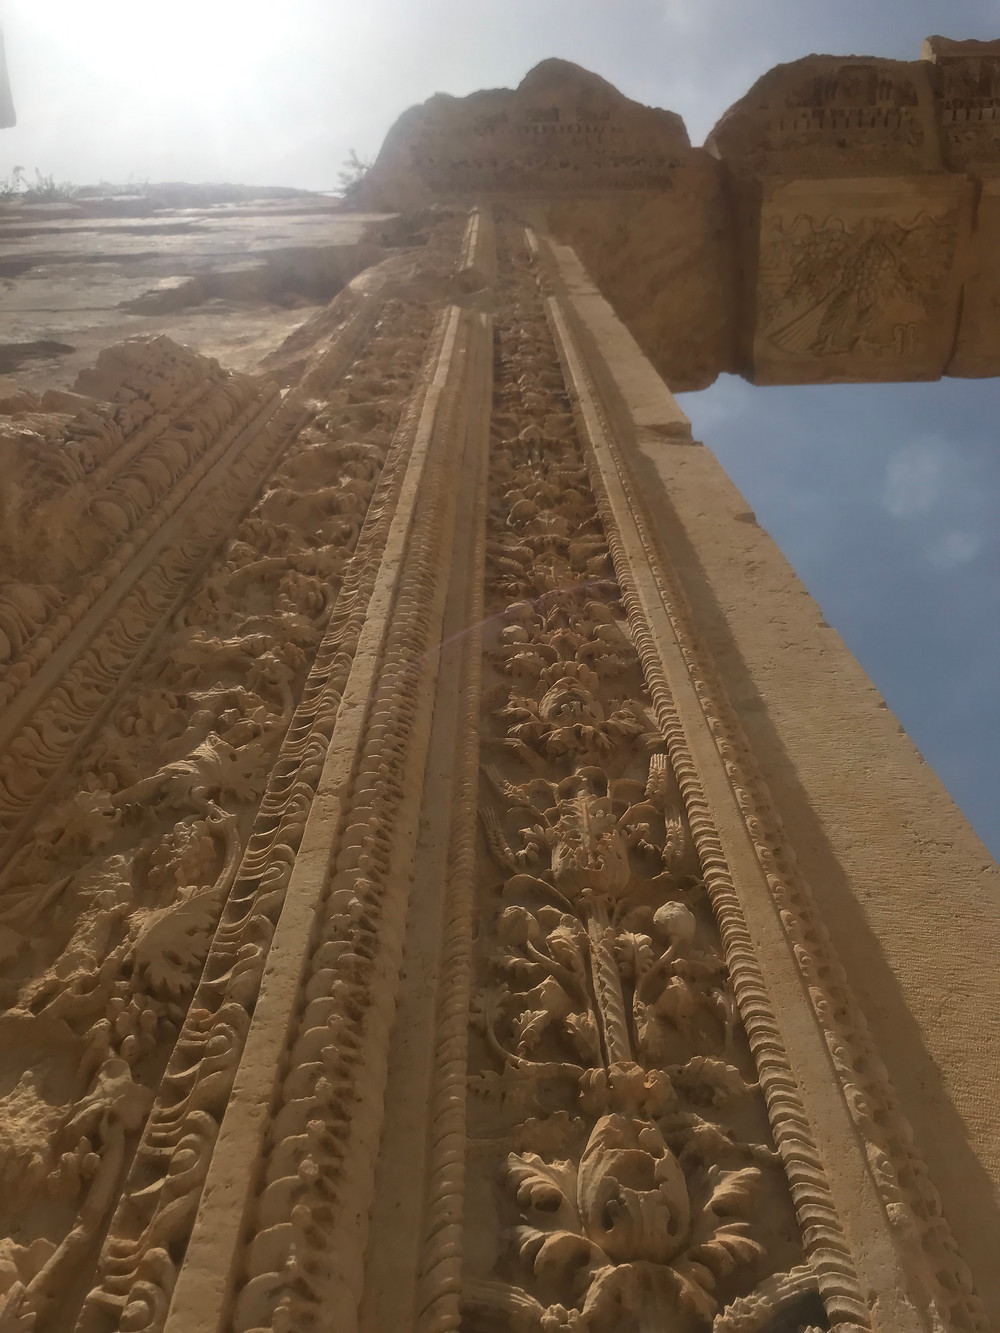 Lebanon, Roman ruins, doorway